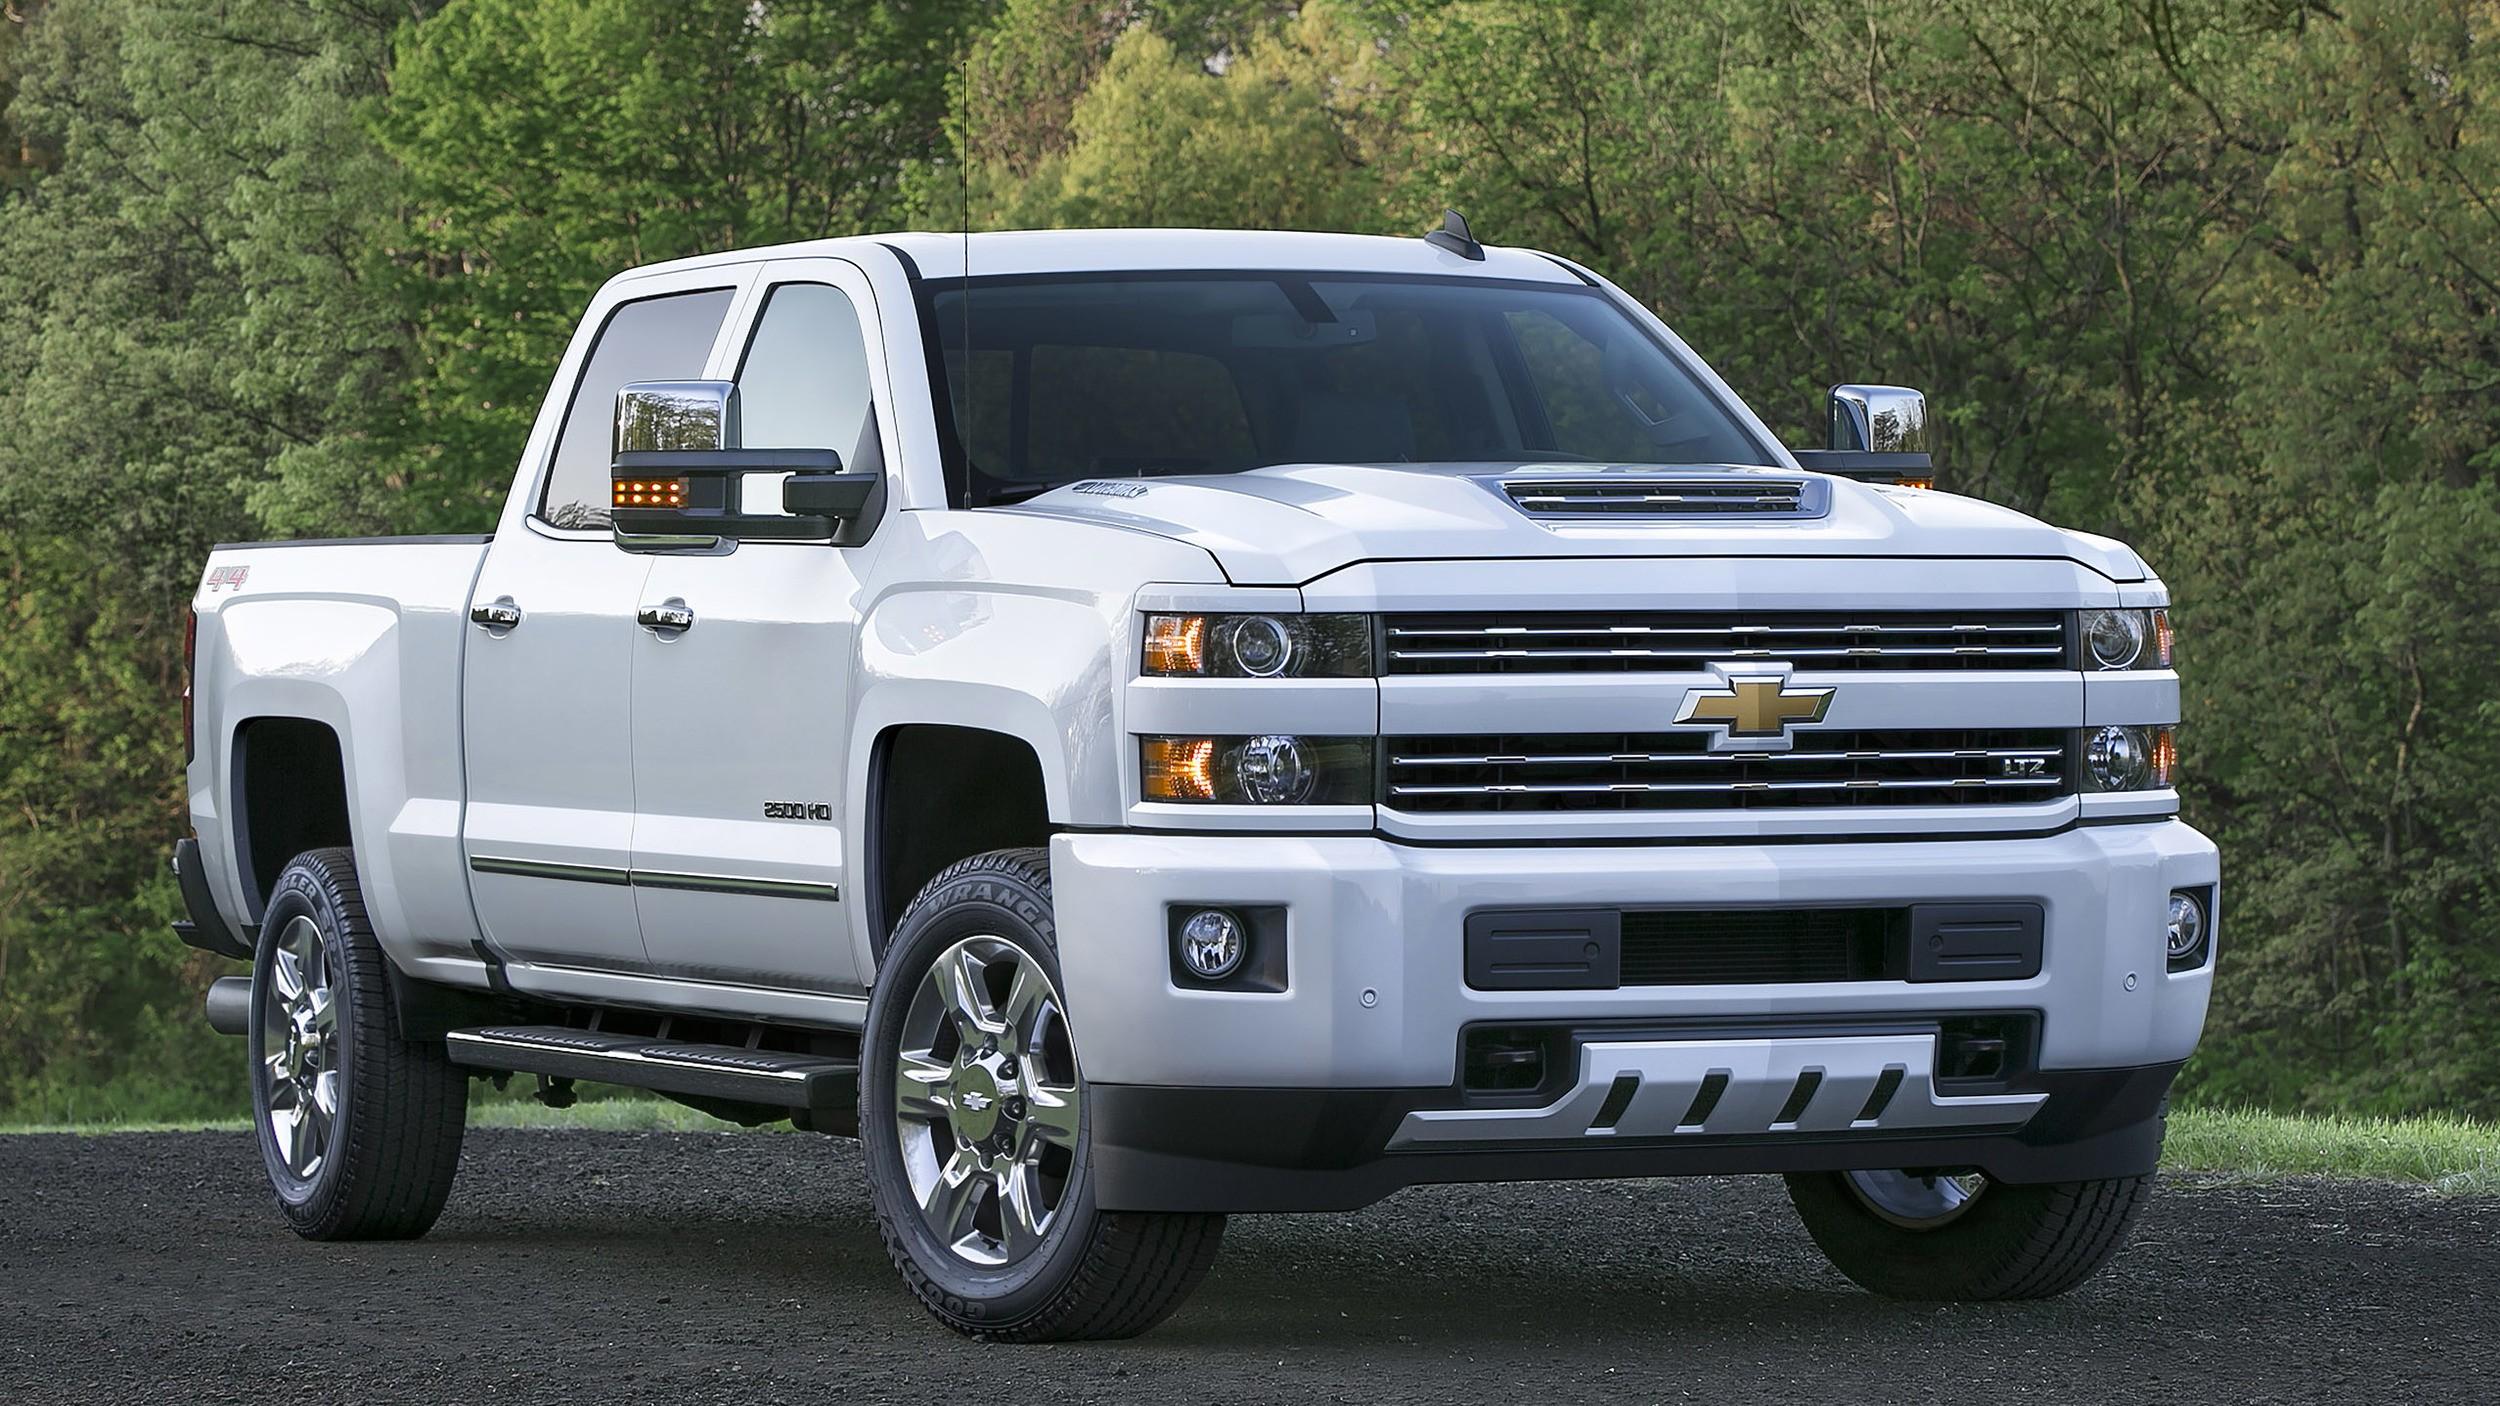 L5p duramax diesel output leaked 445 horsepower 910 lb ft of torque